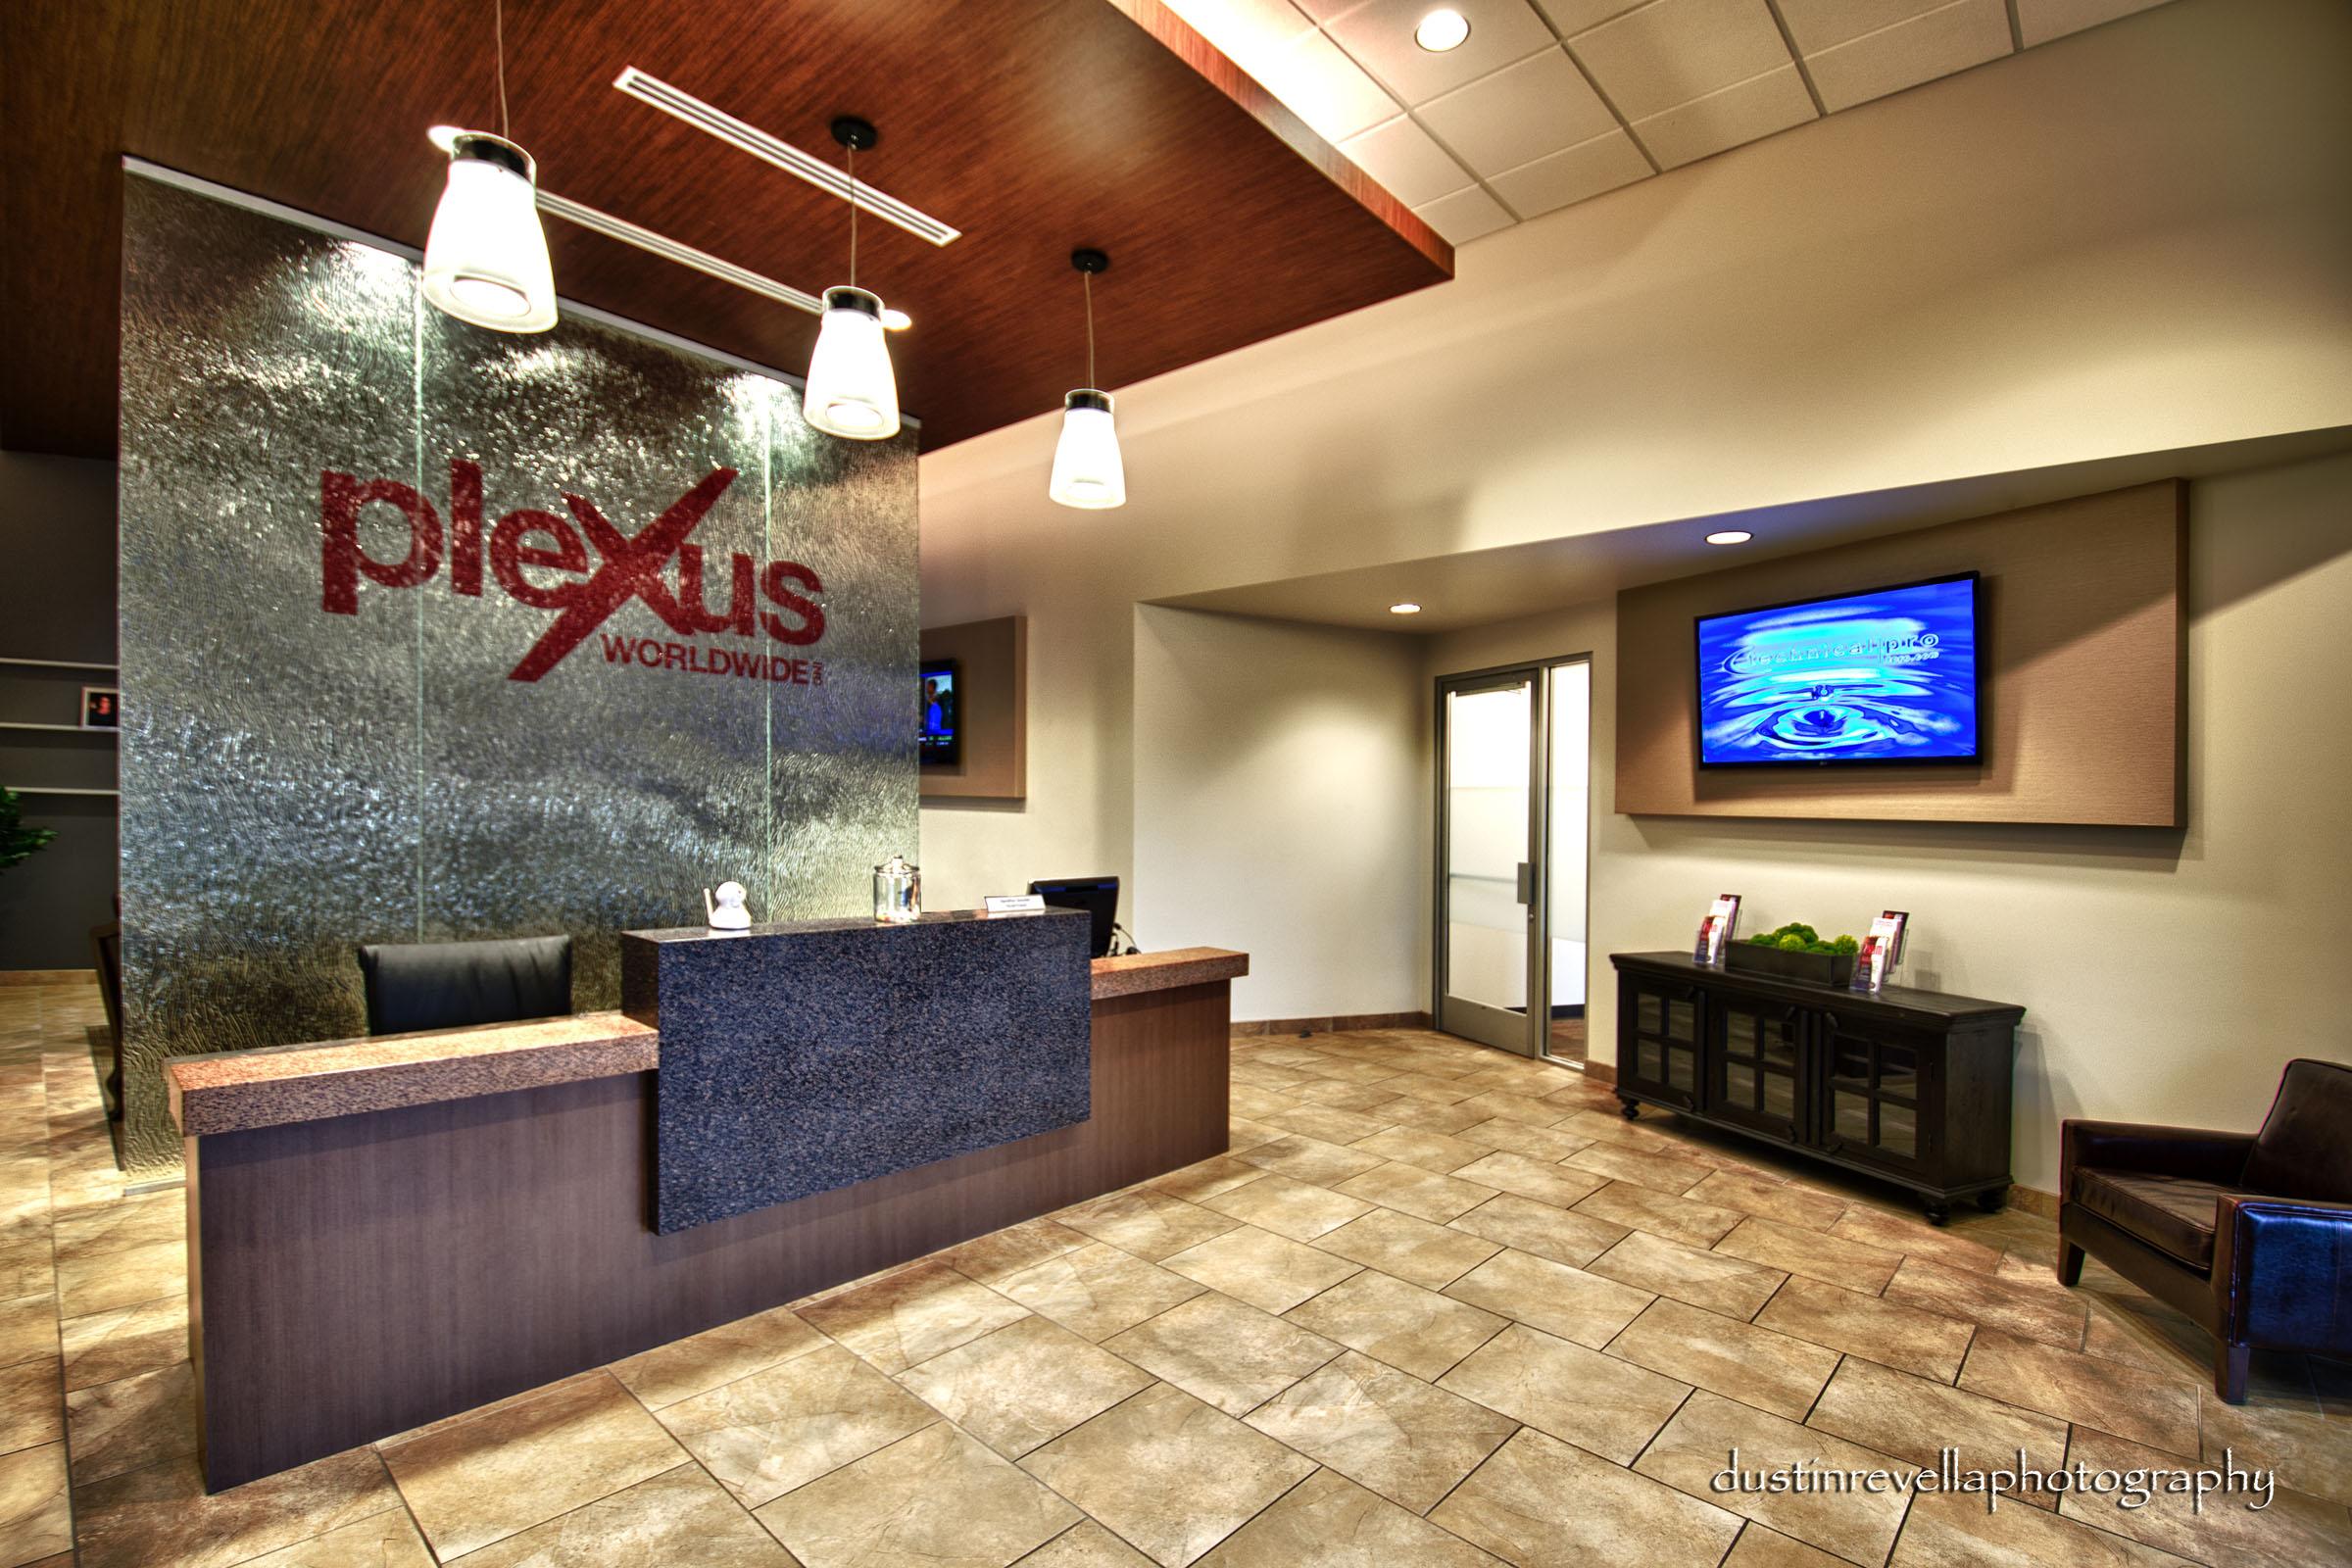 Plexus Worldwide Lobby